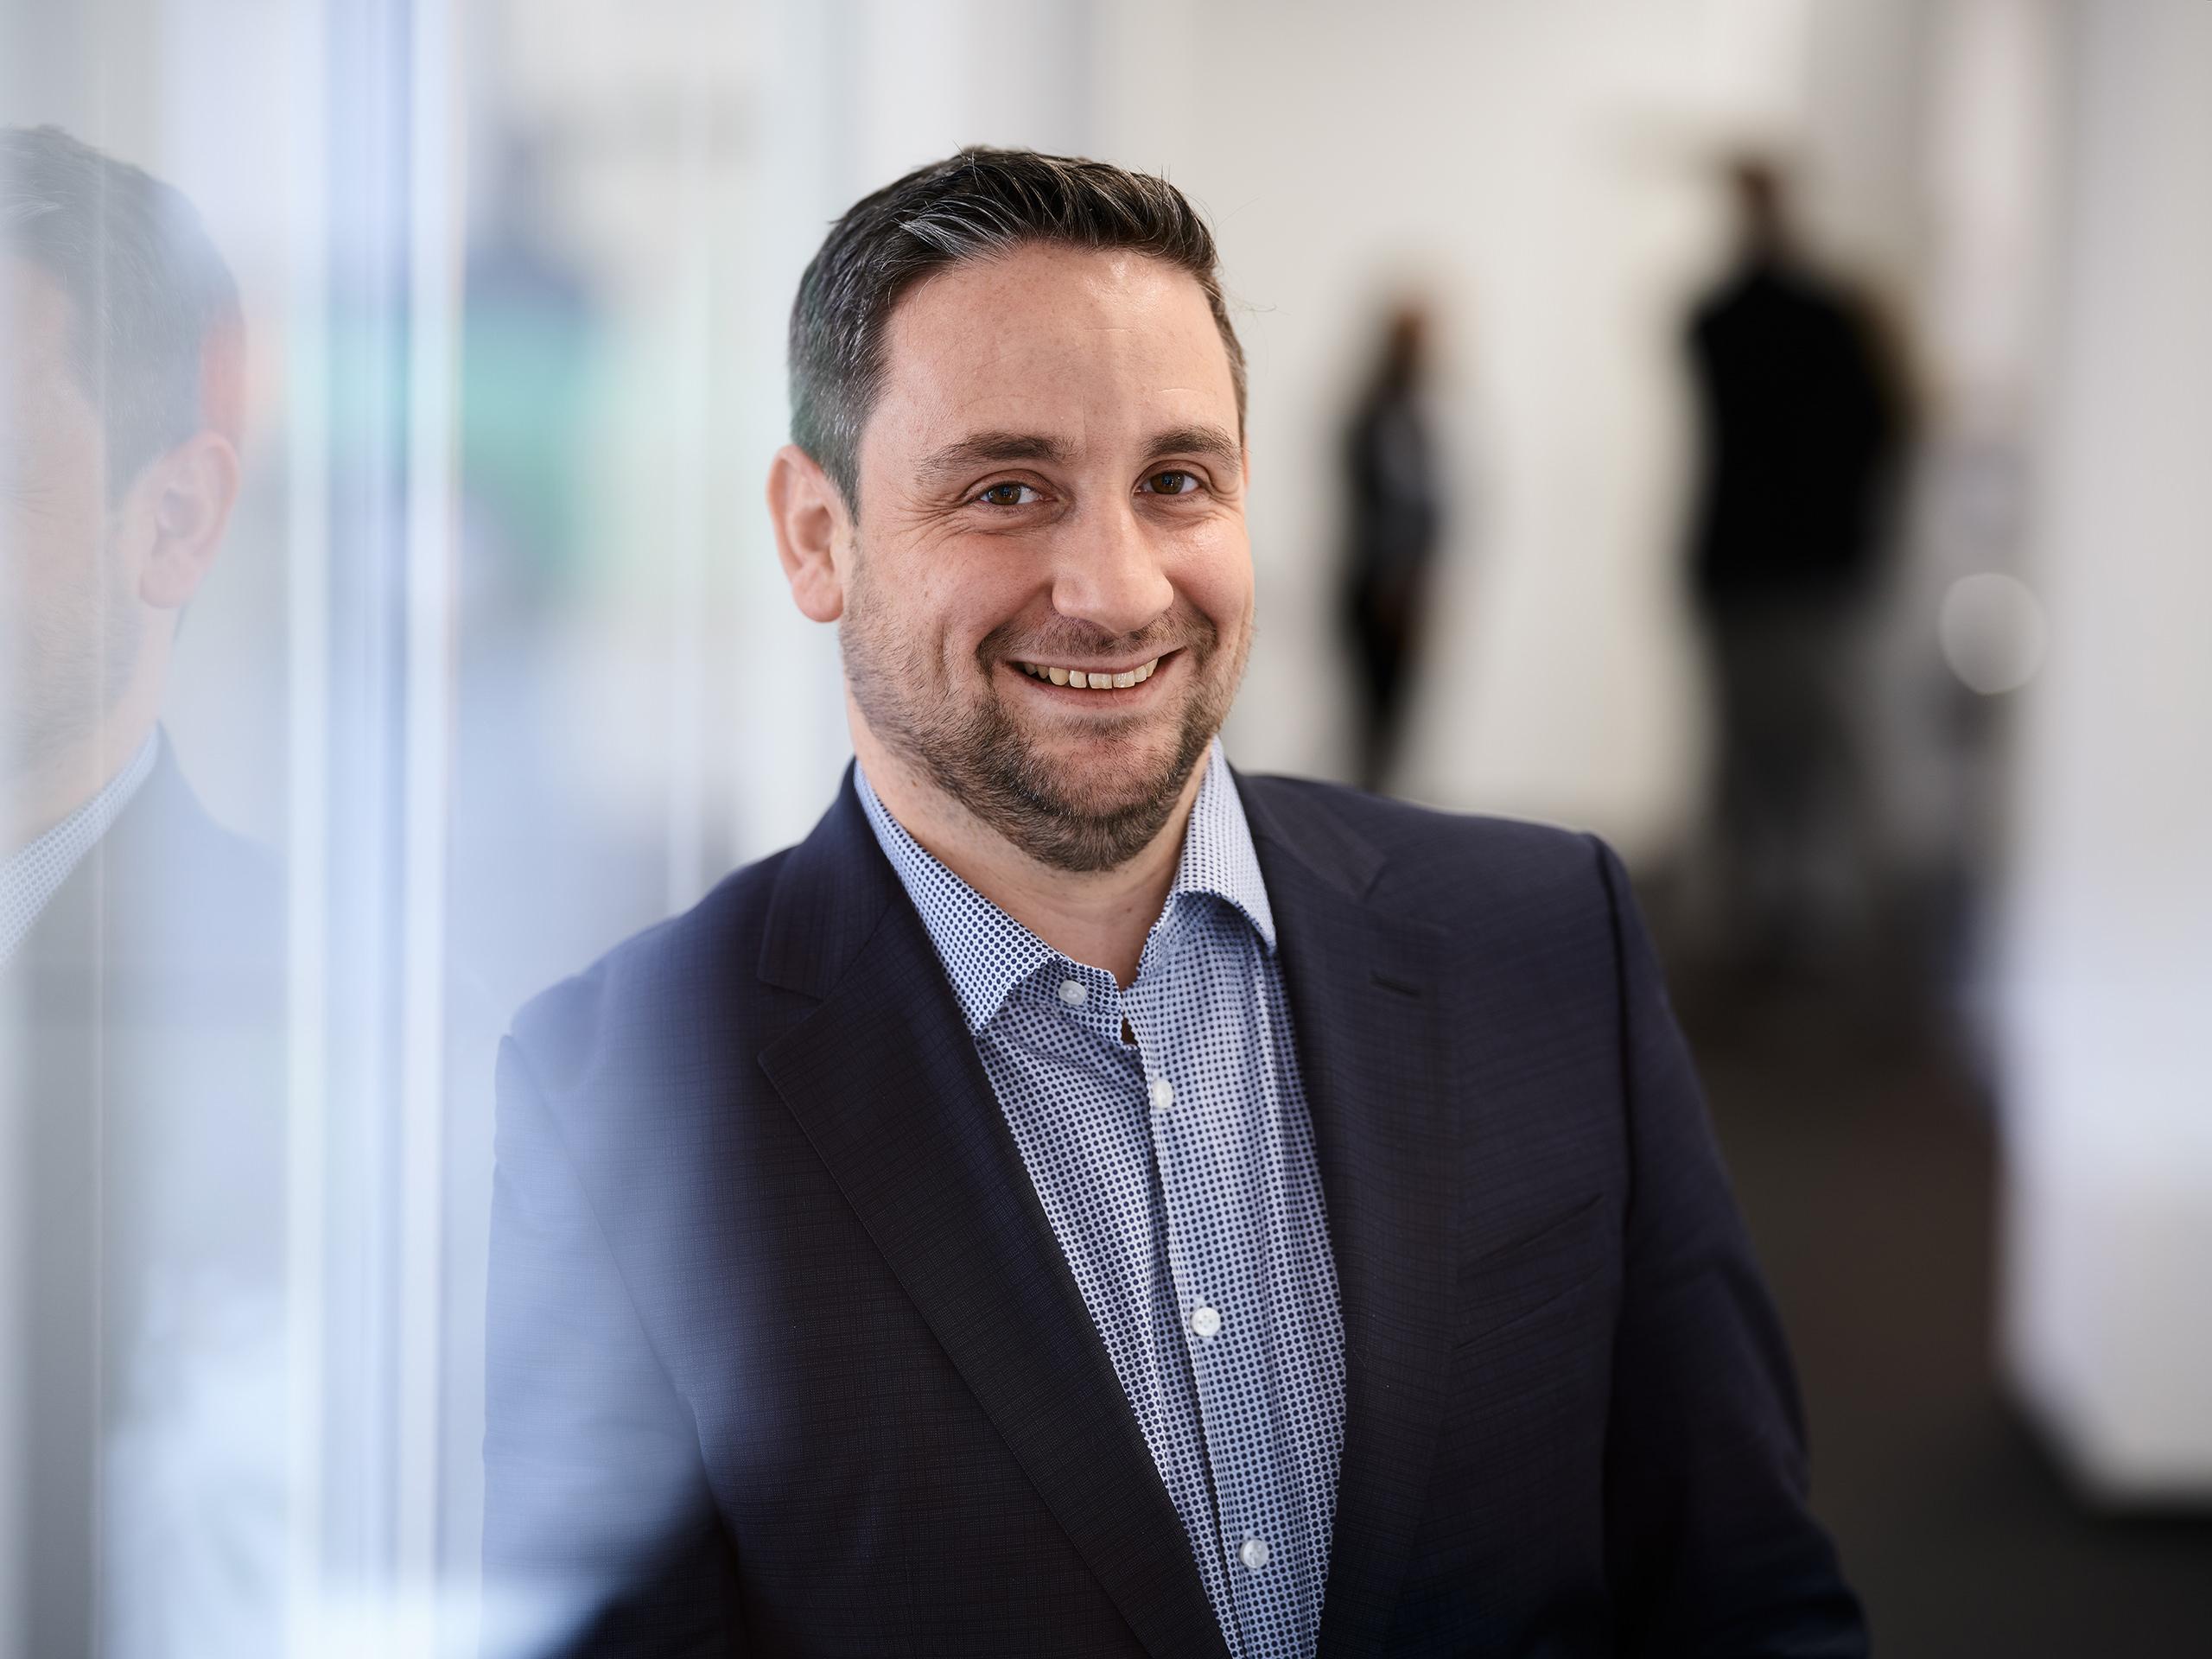 Michael Faller, Steuerberater Partner